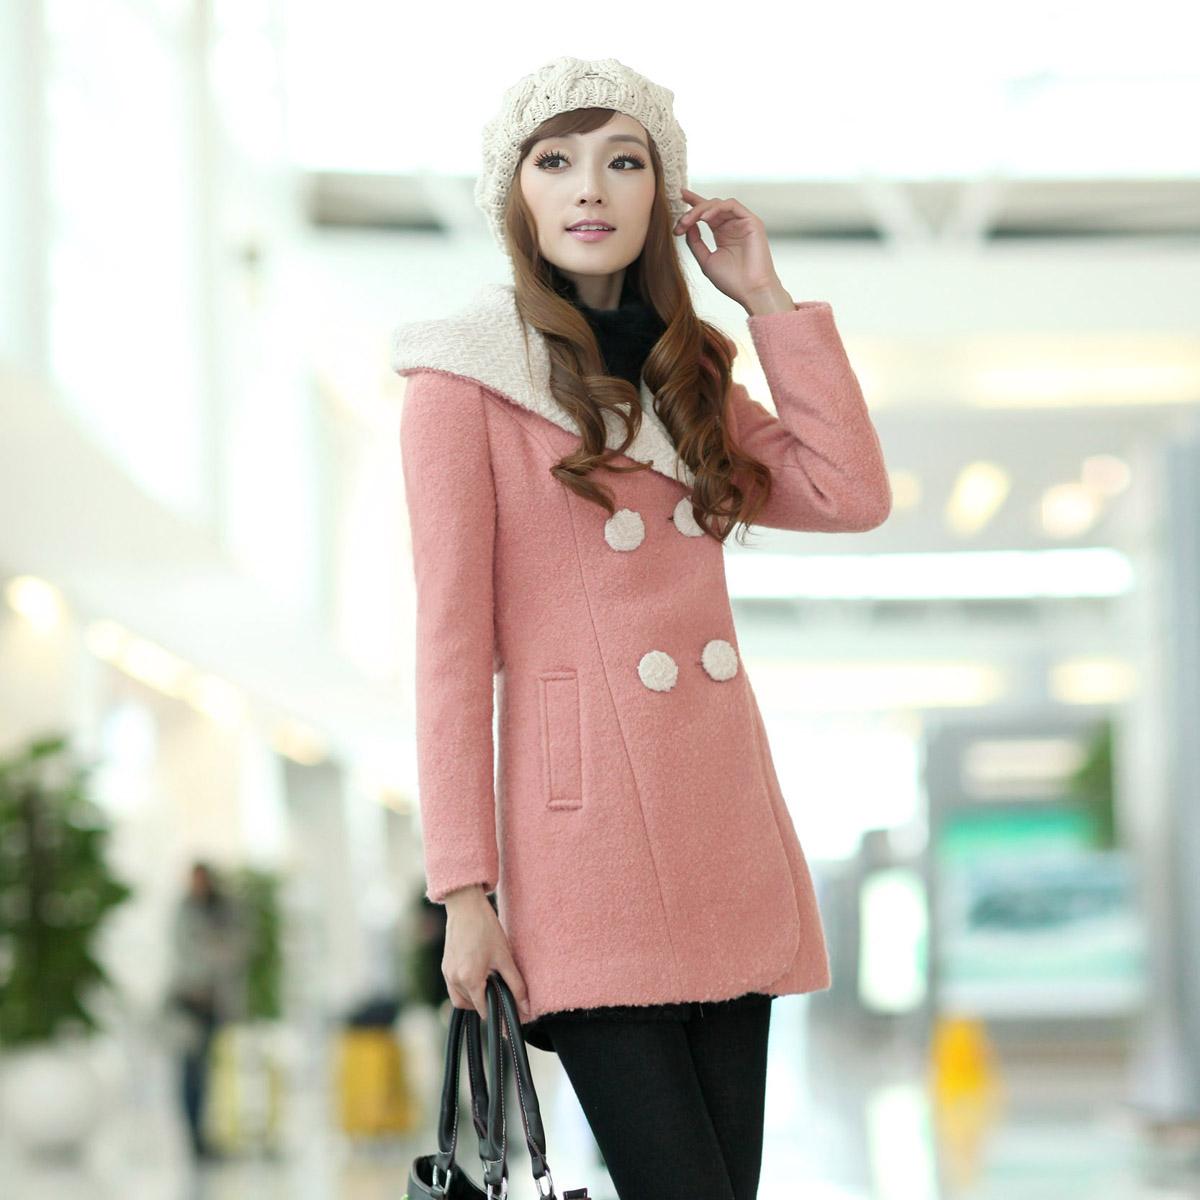 Winter Fashion 2013